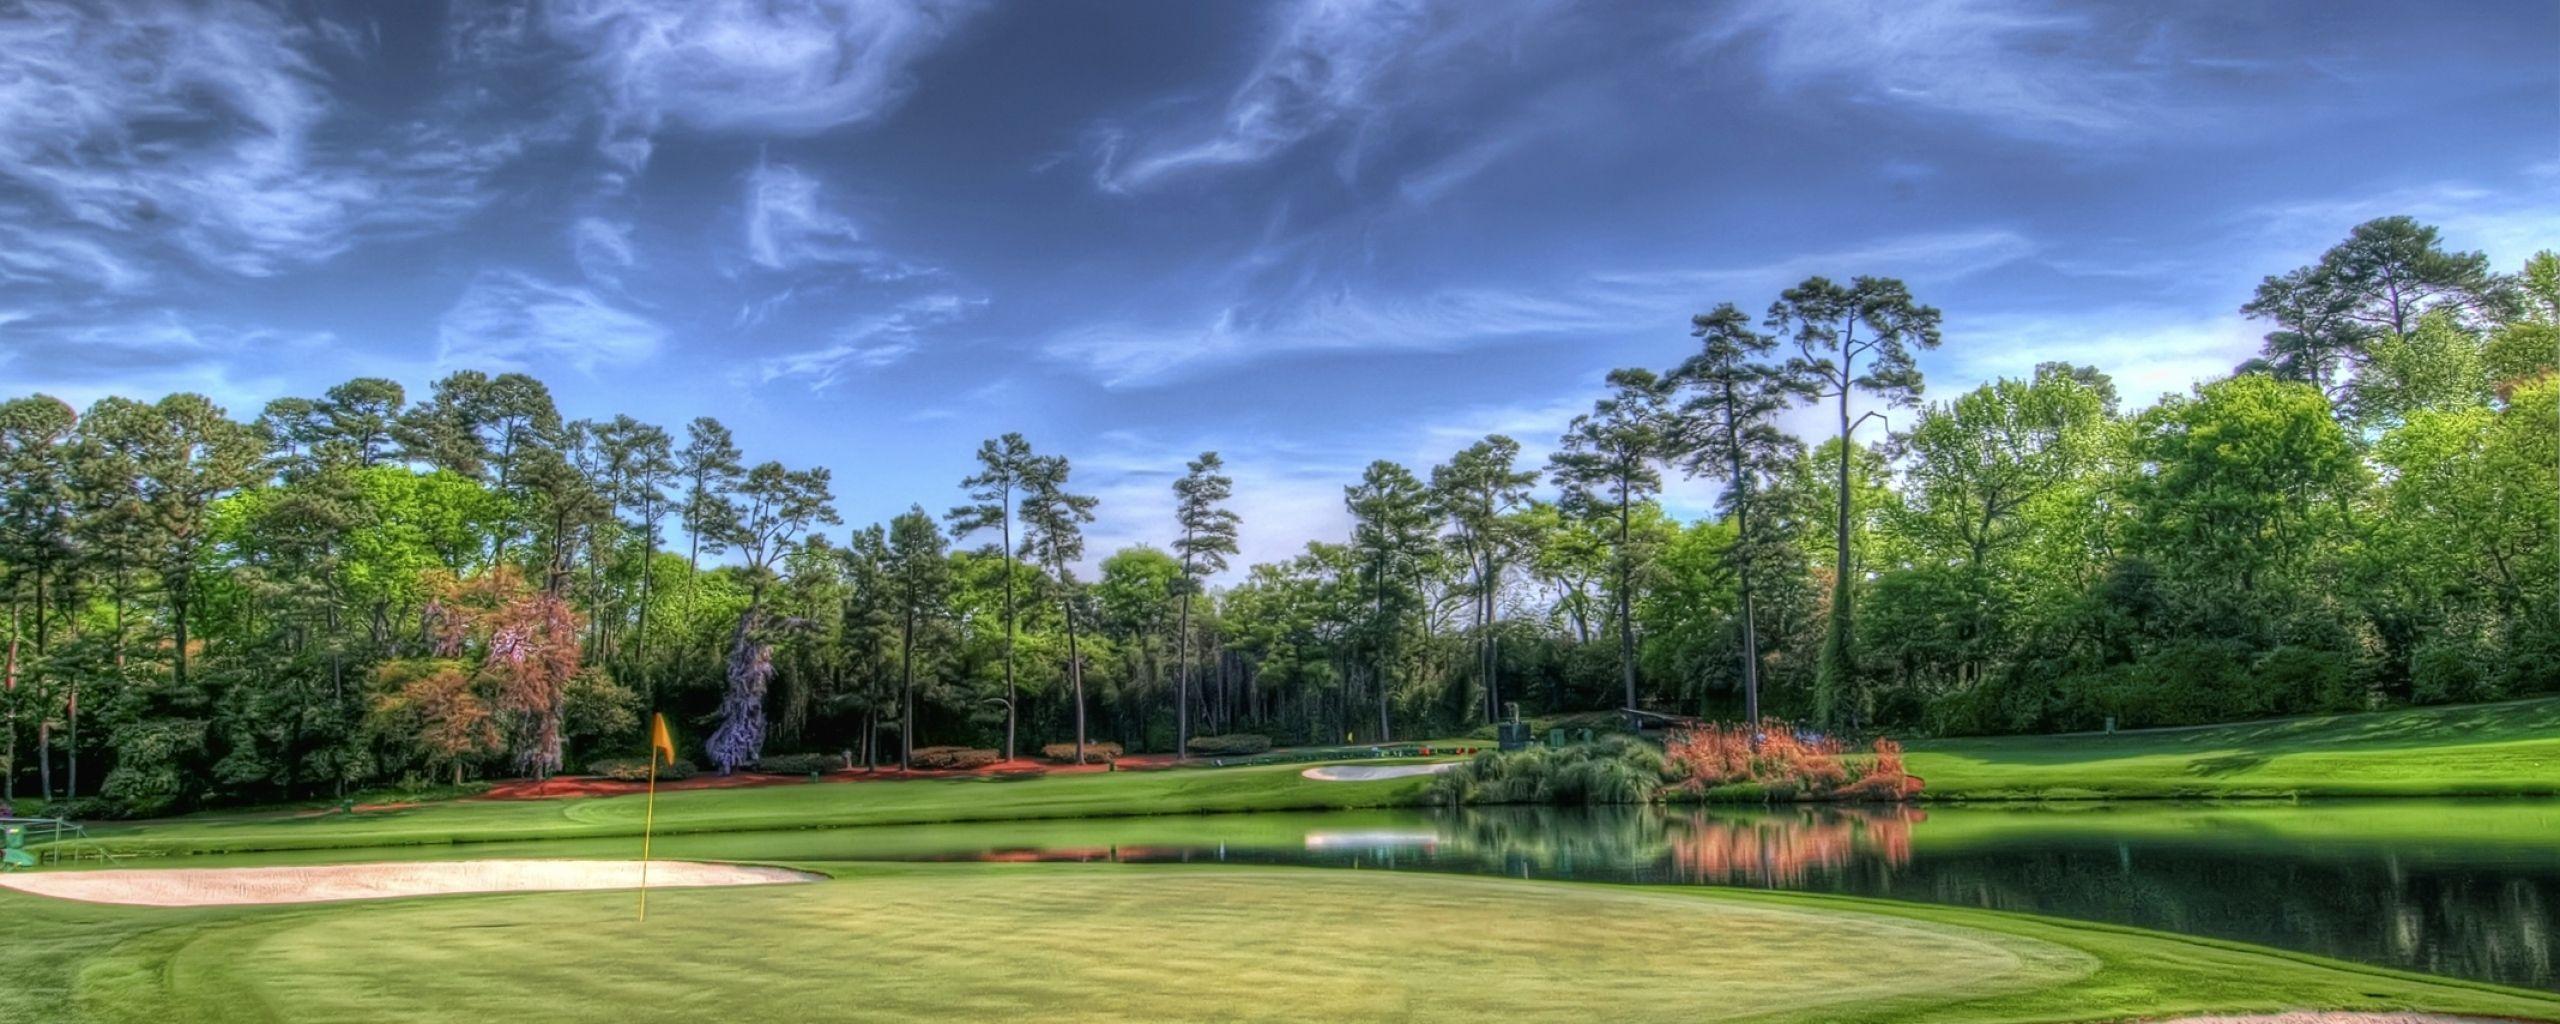 Full Screen Golf Wallpapers Top Free Full Screen Golf